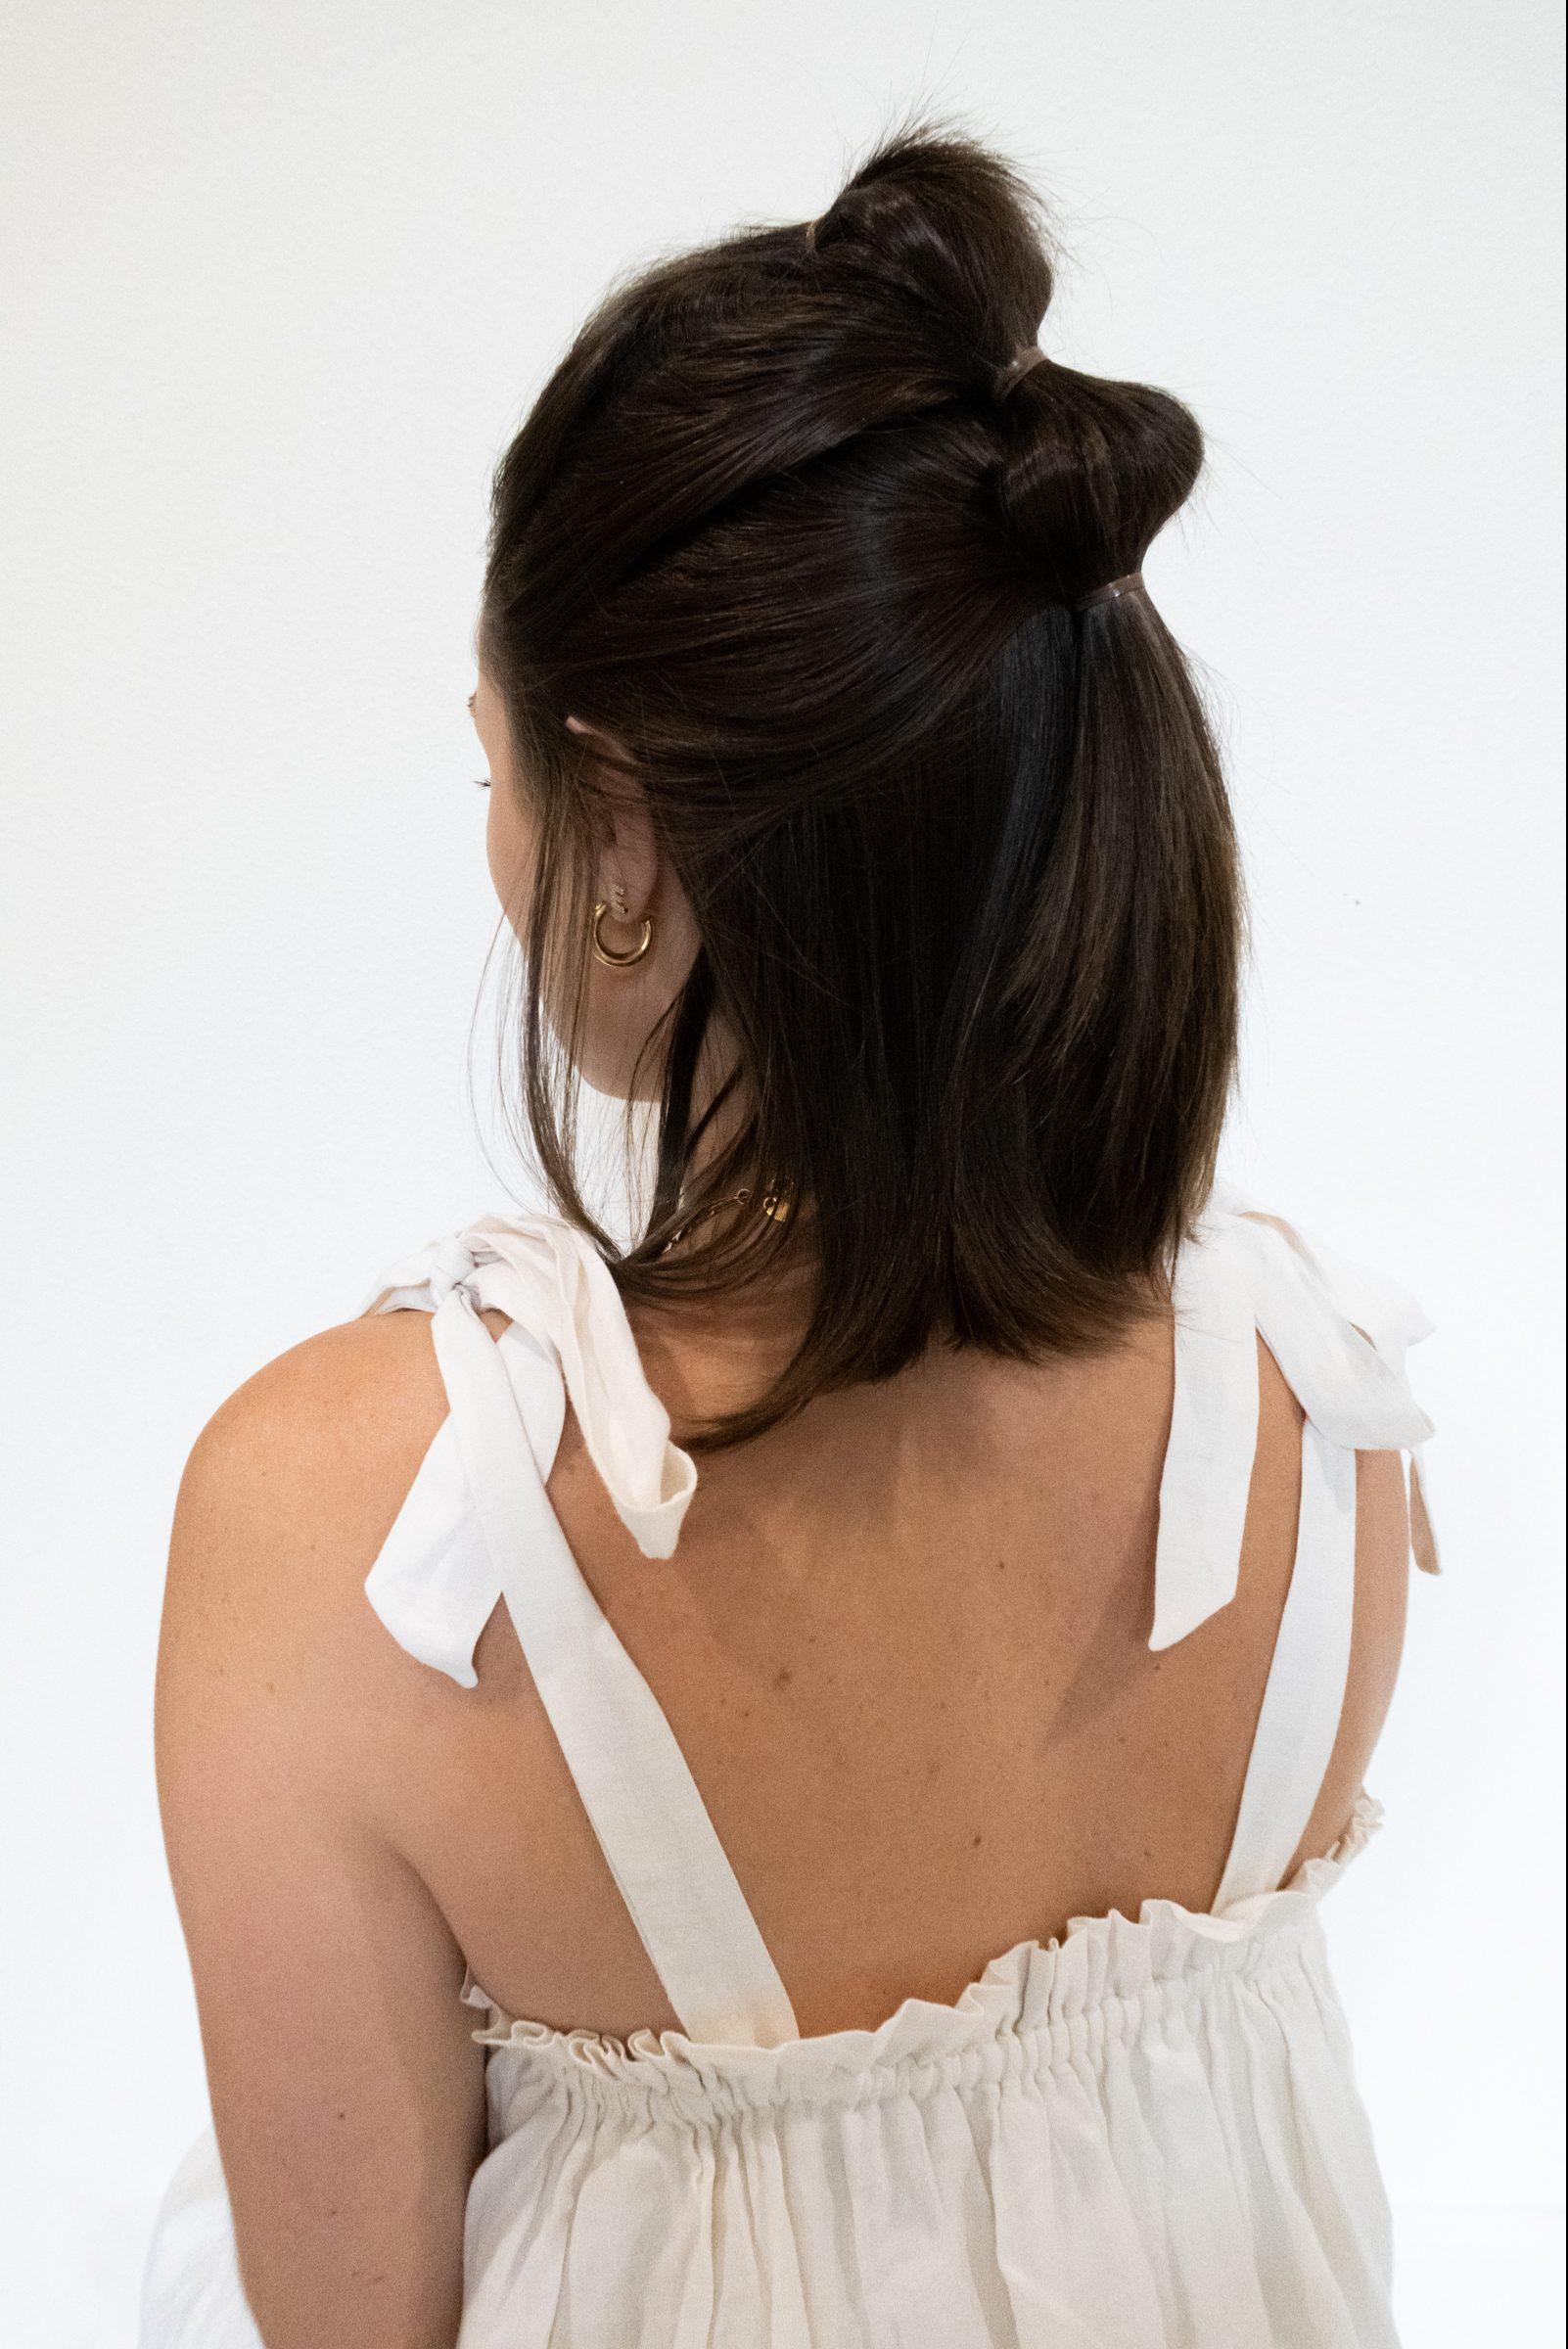 Elly brown shares how a bubble braid for short hair tutorial!